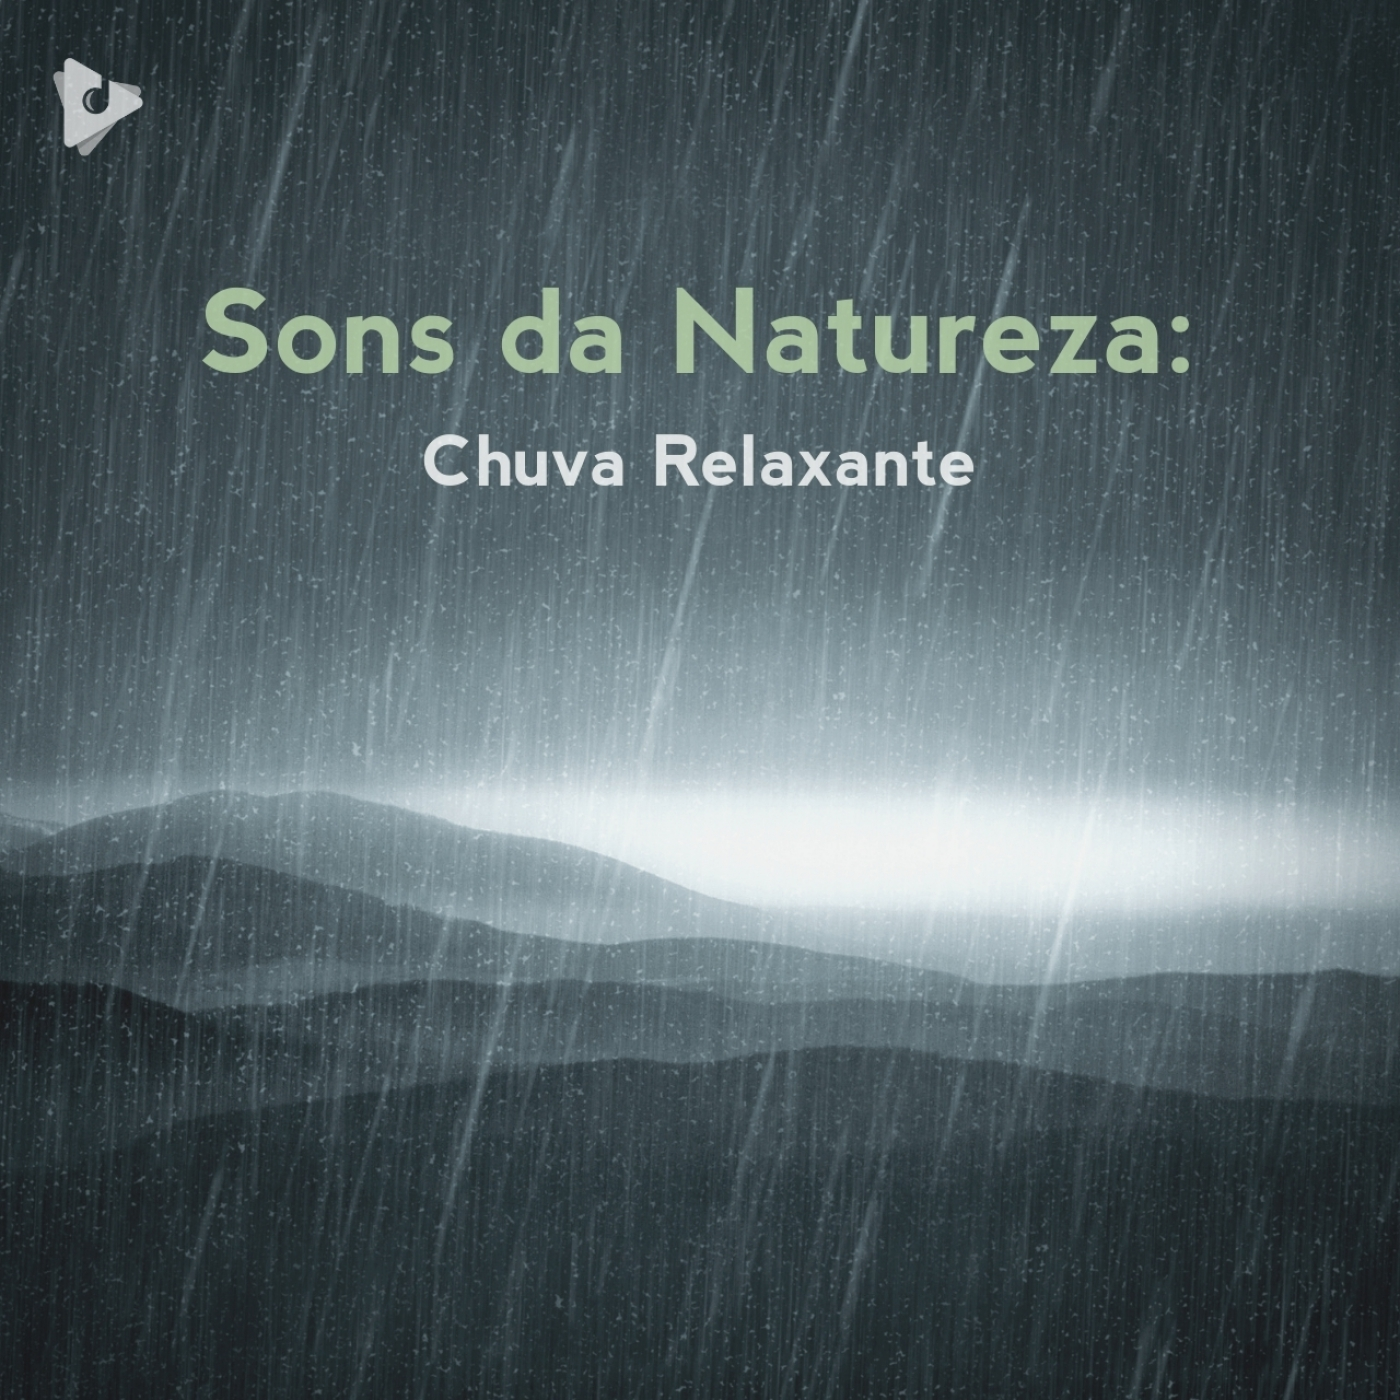 Sons da Natureza: Chuva Relaxante